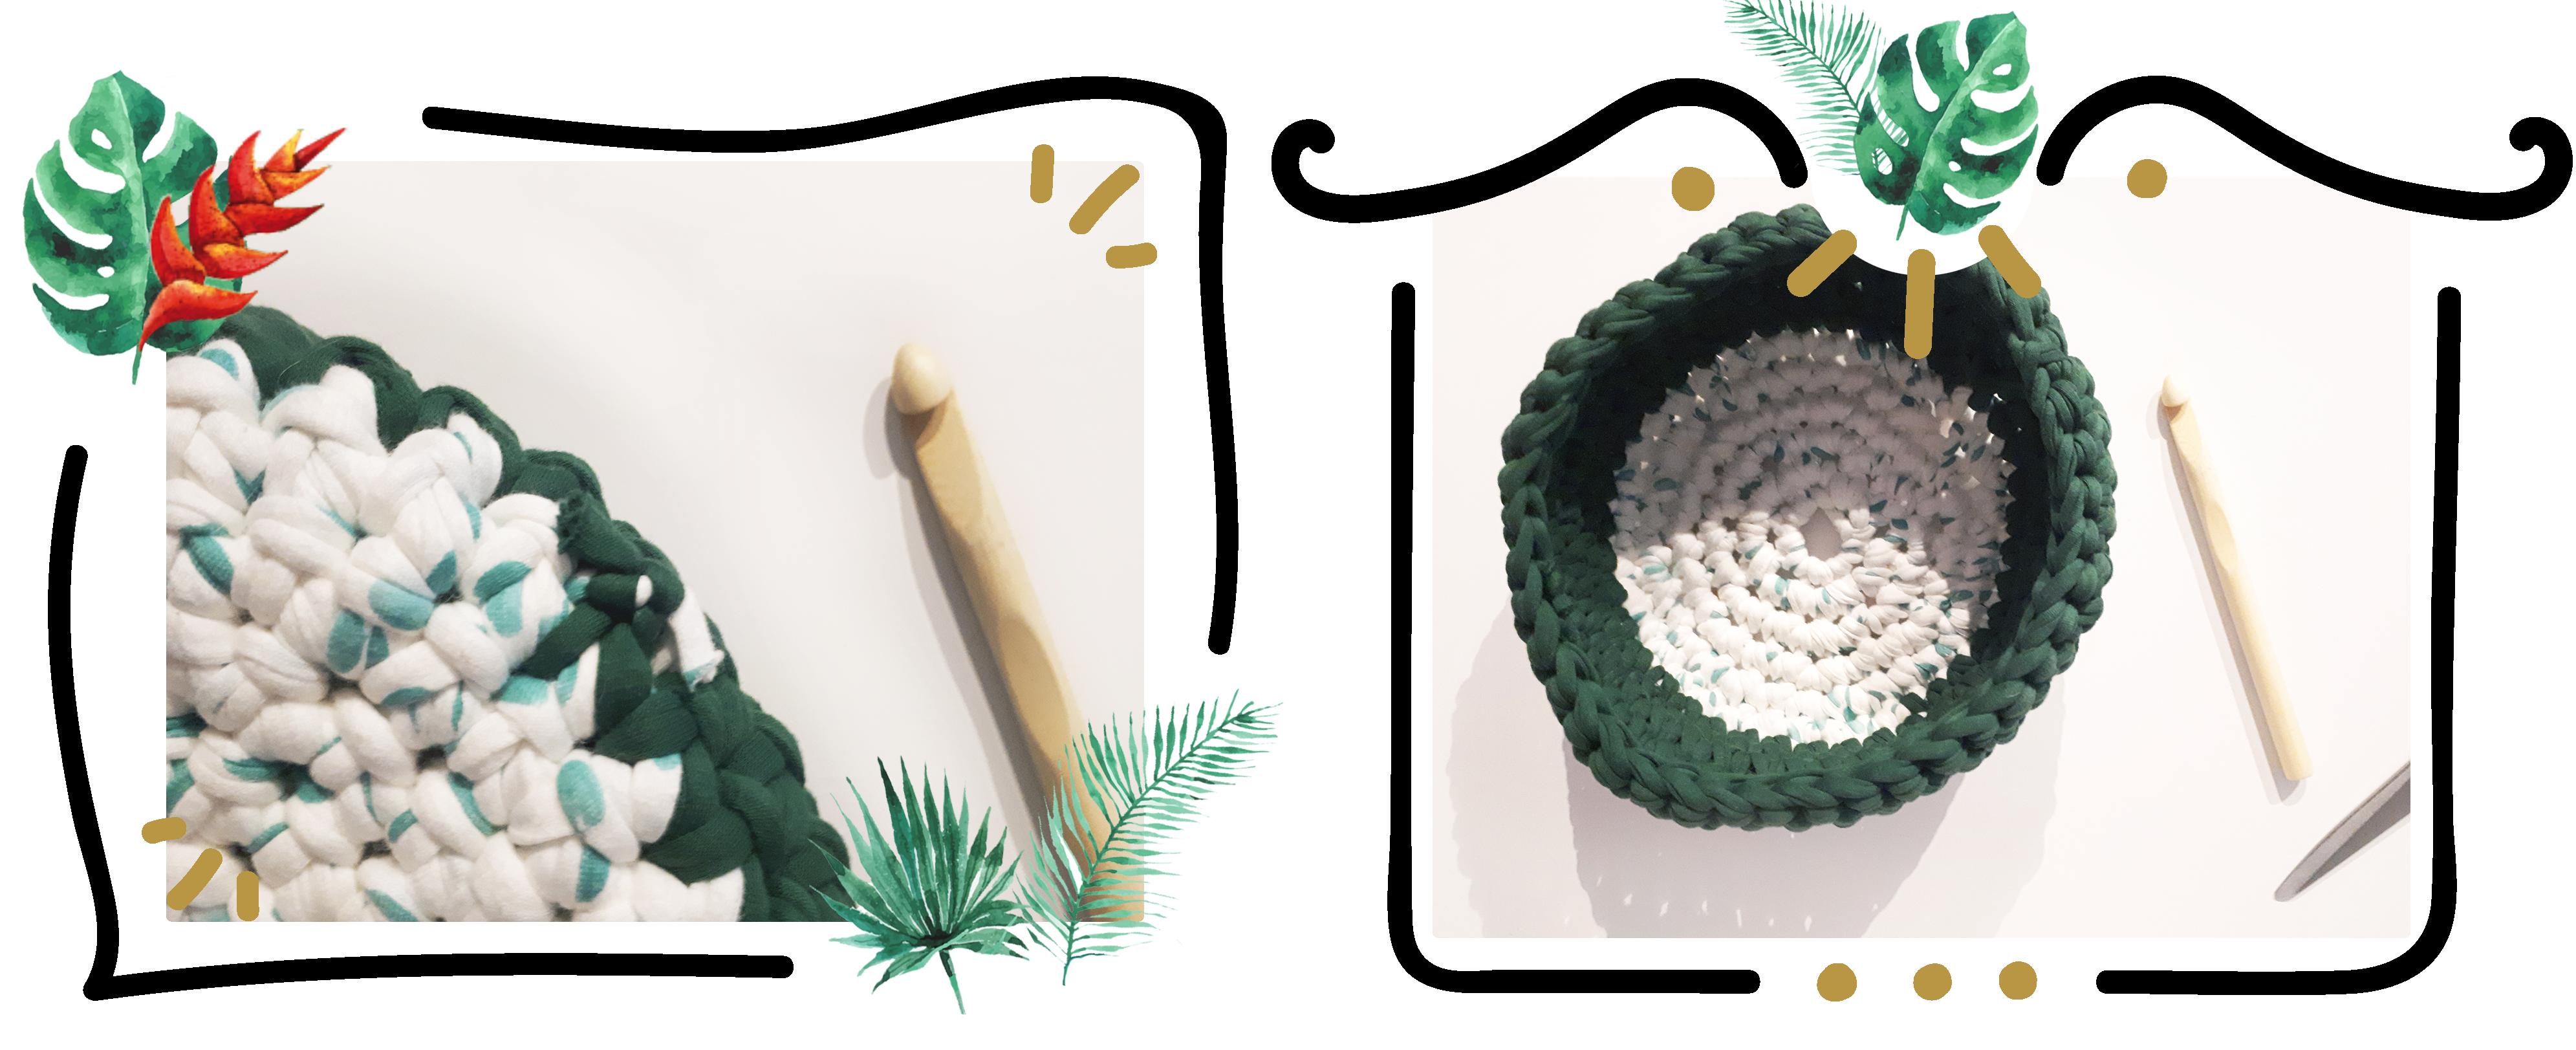 DIY-panier-crochet-kooked-etape-11-12